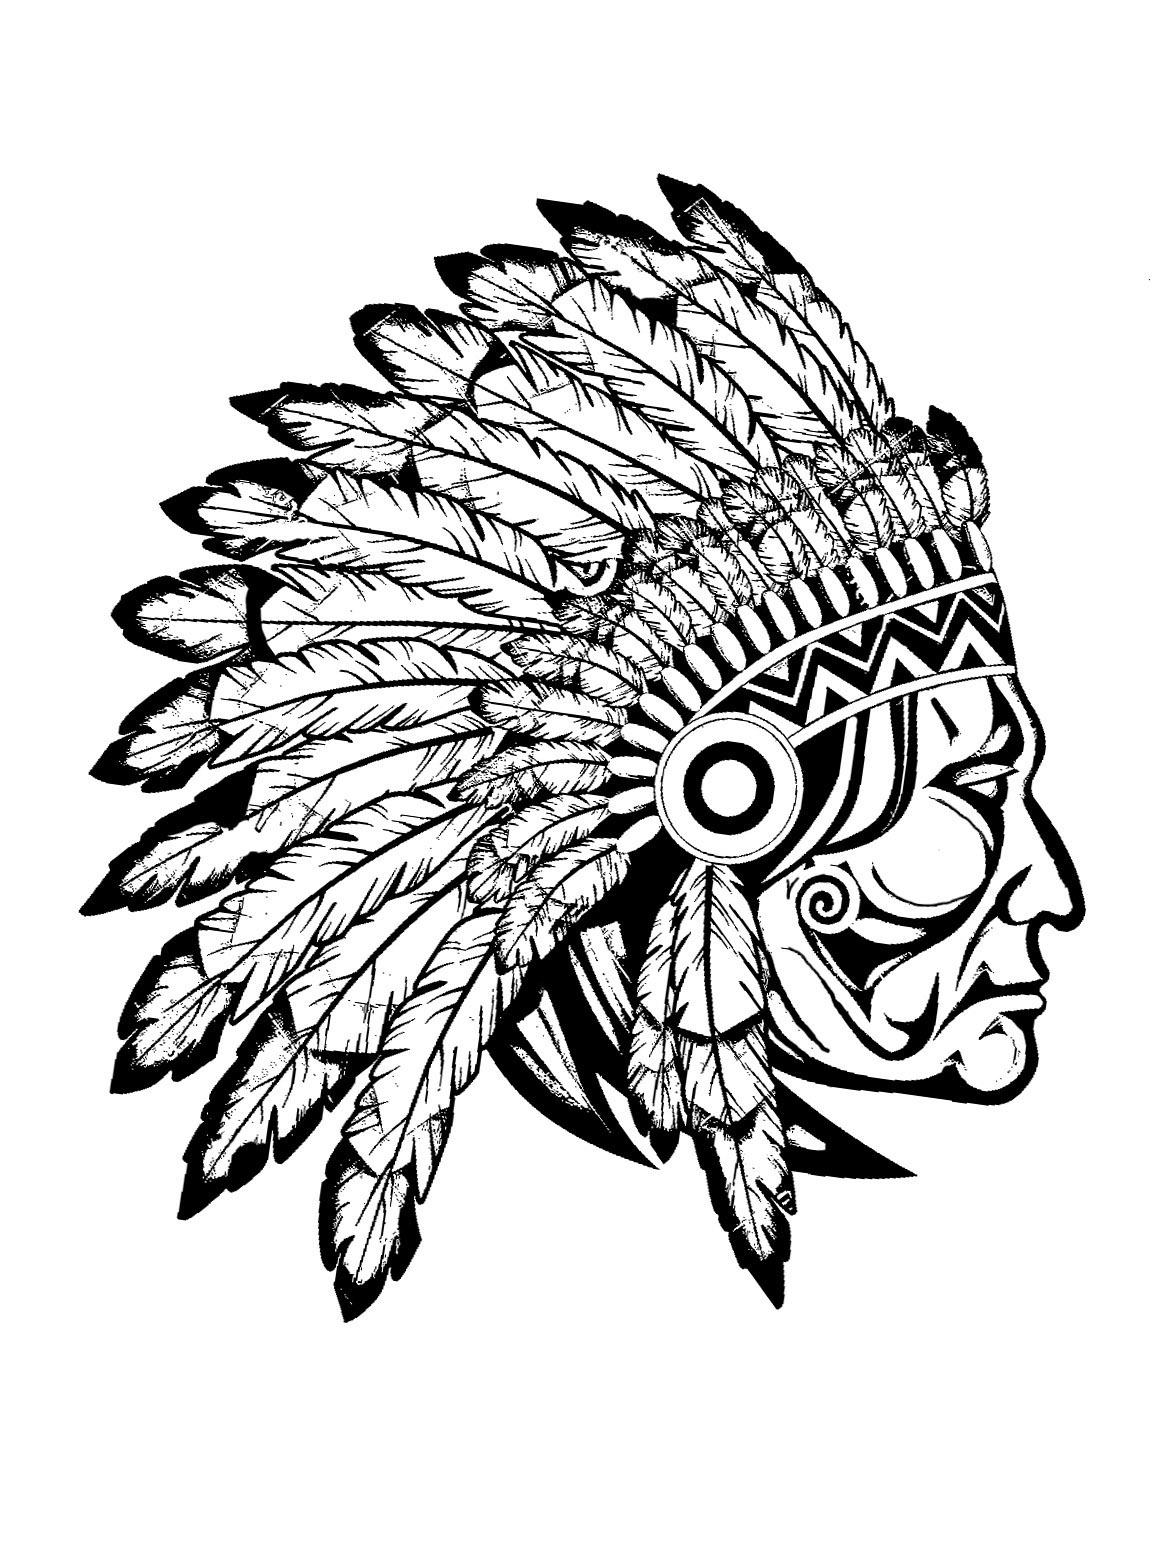 1174x1542 Indian Native Chief Profile